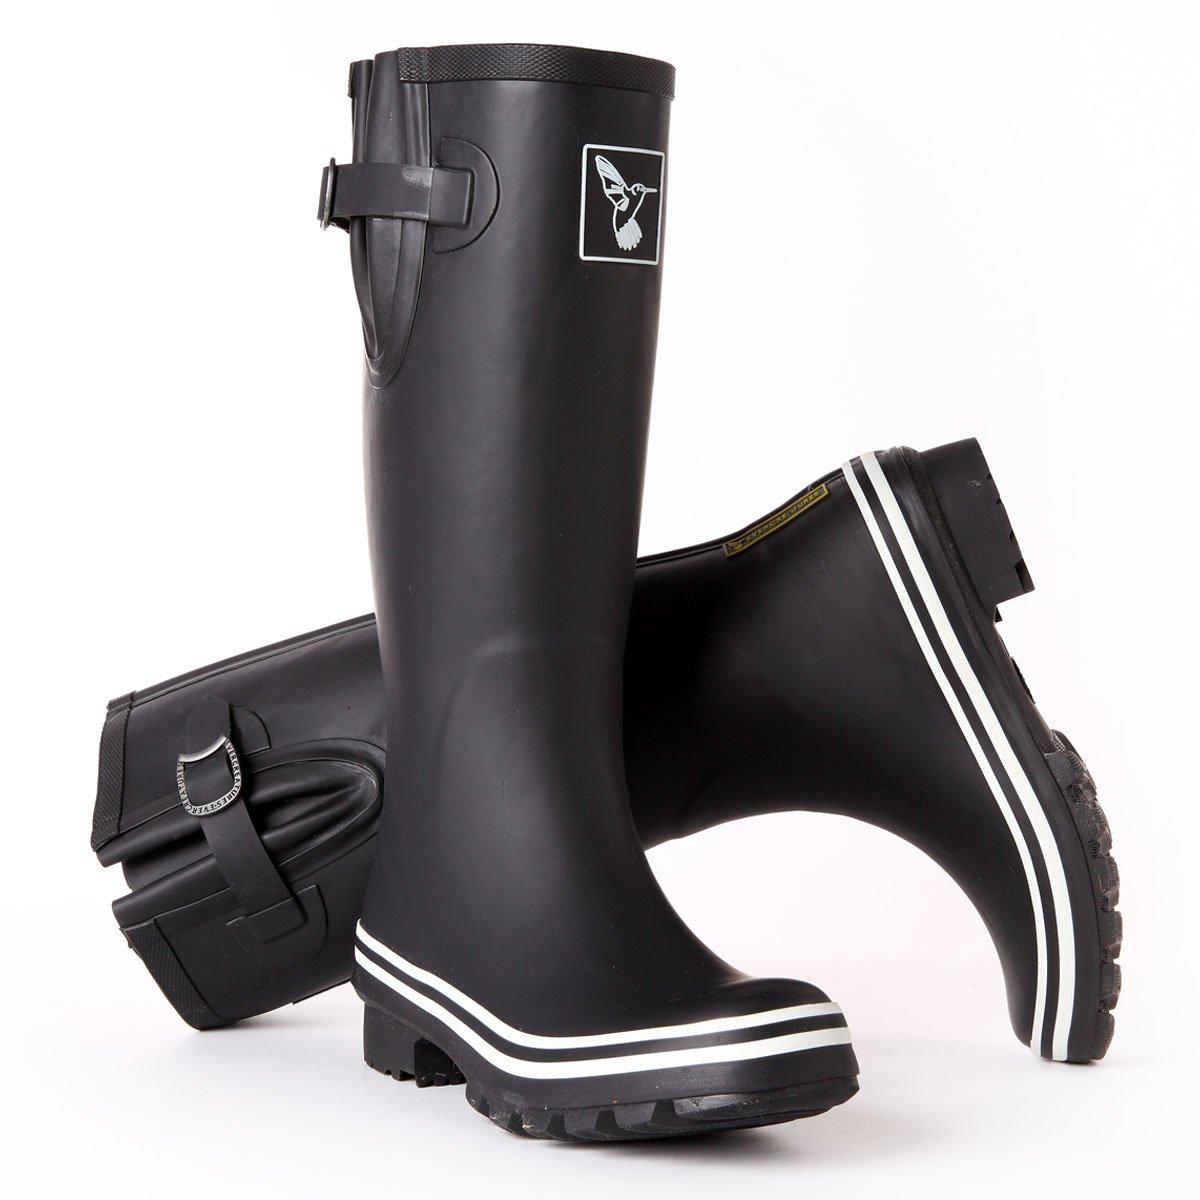 Evercreatures Women's Rain Boots UK Brand Original Tall Rain Boot Gumboots Wellies B00G0S3JQ8 10 B(M) US / UK8 / EU41|Black